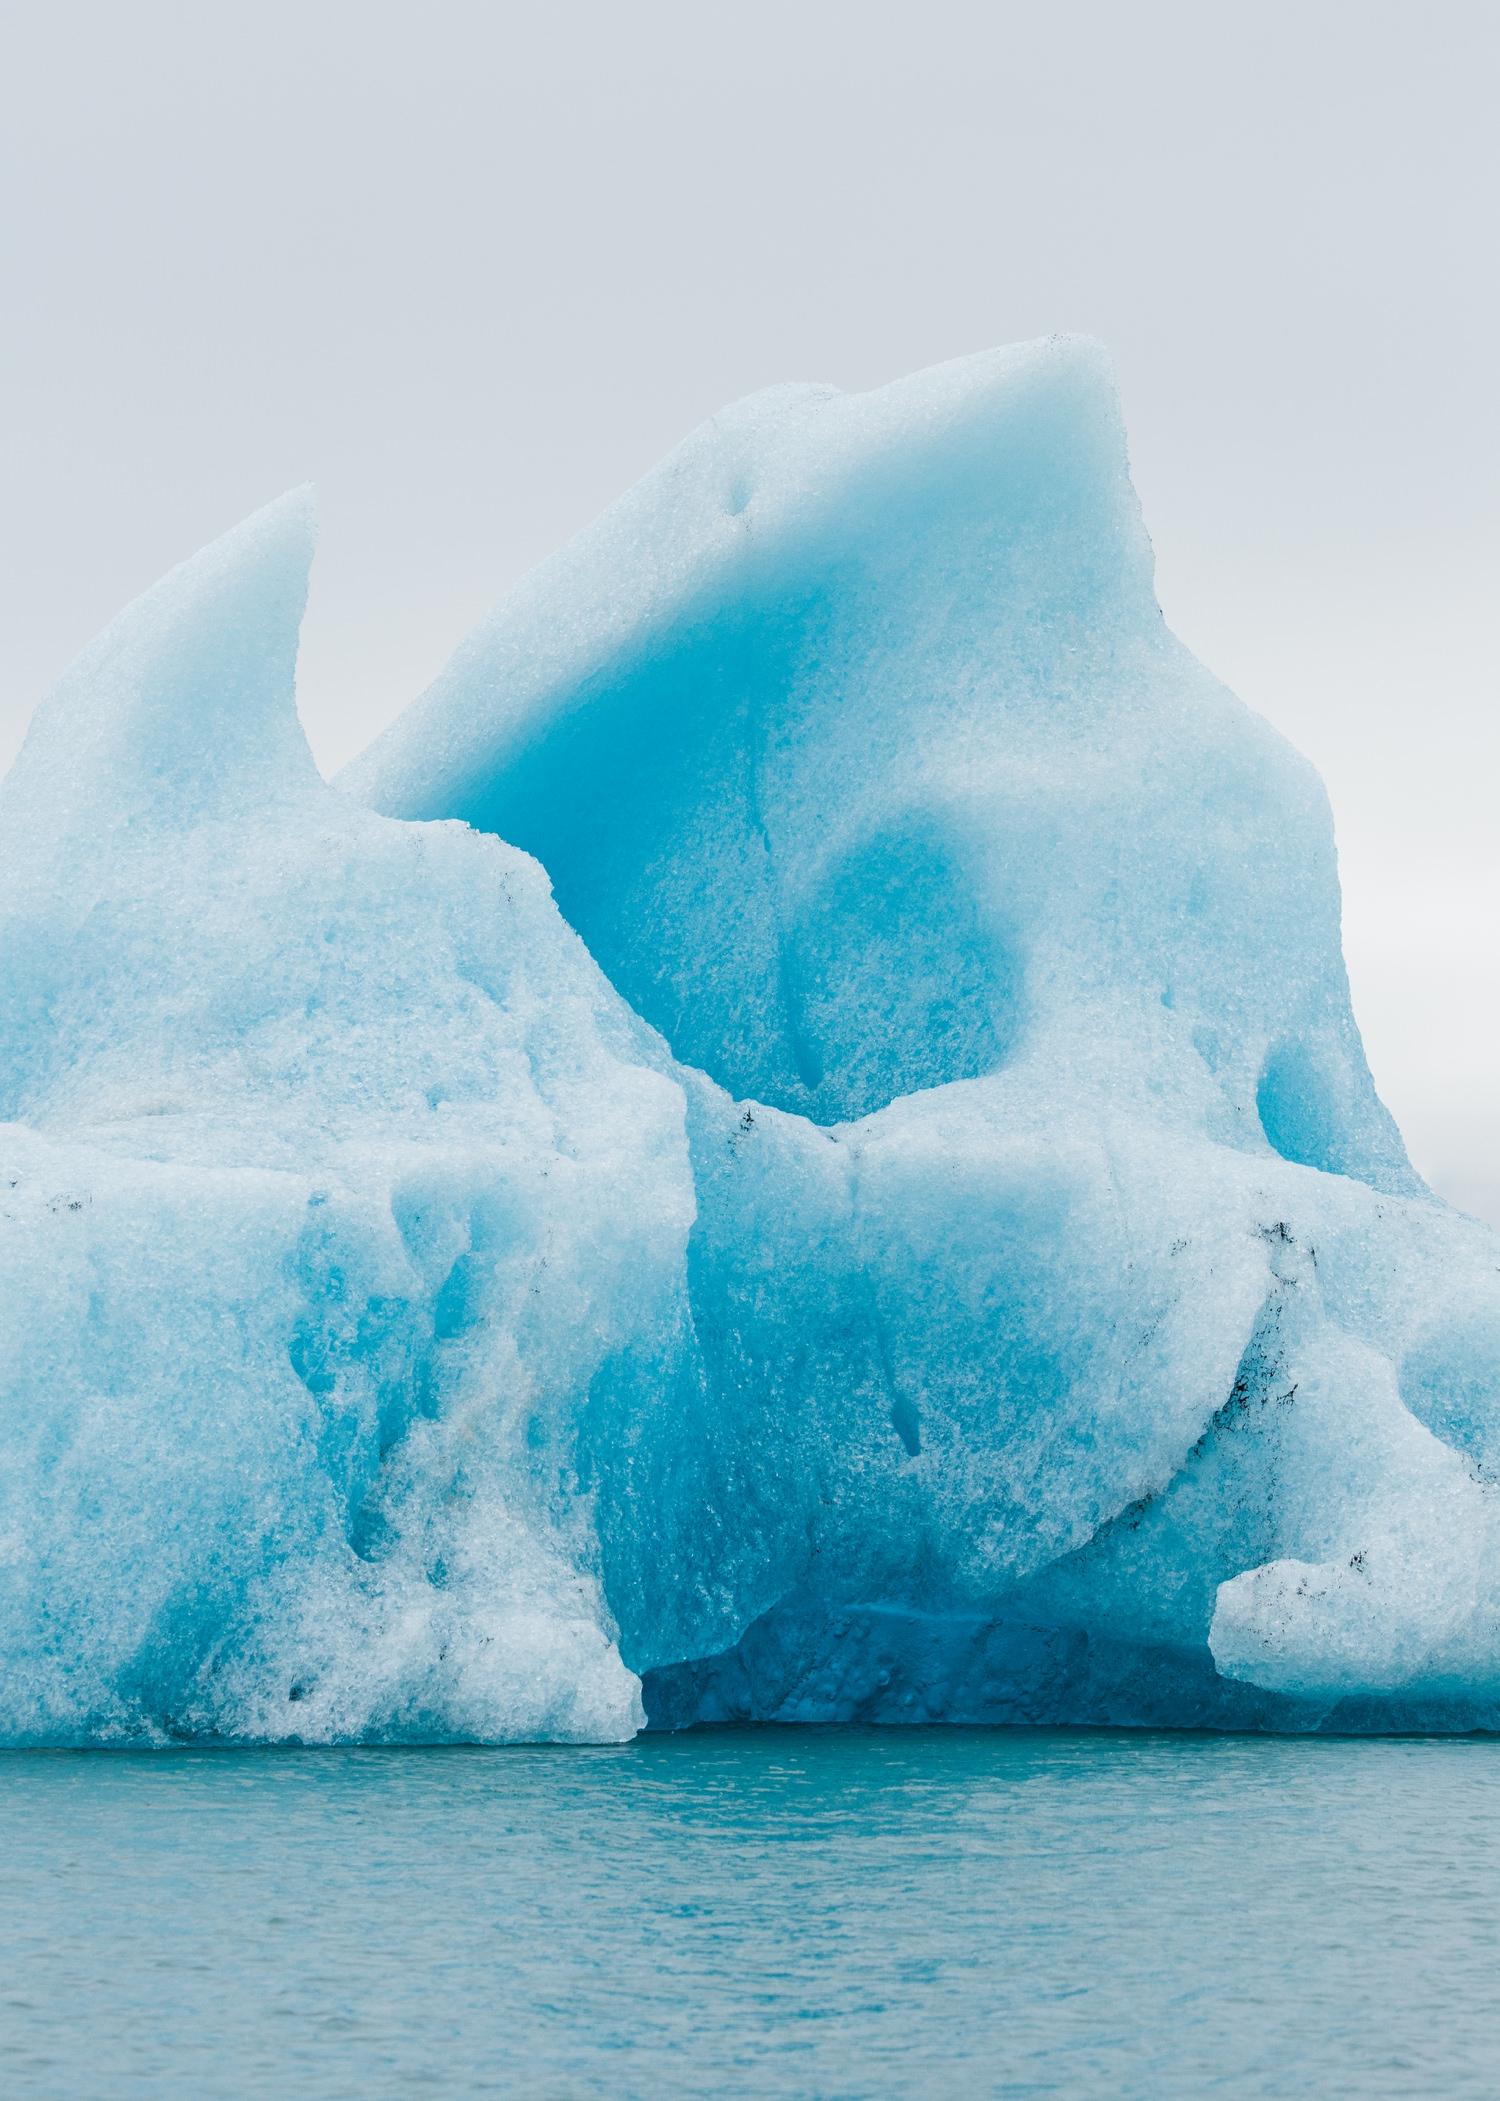 cameron-zegers-travel-editorial-photographer-iceland-national-geographic-iceberg.jpg